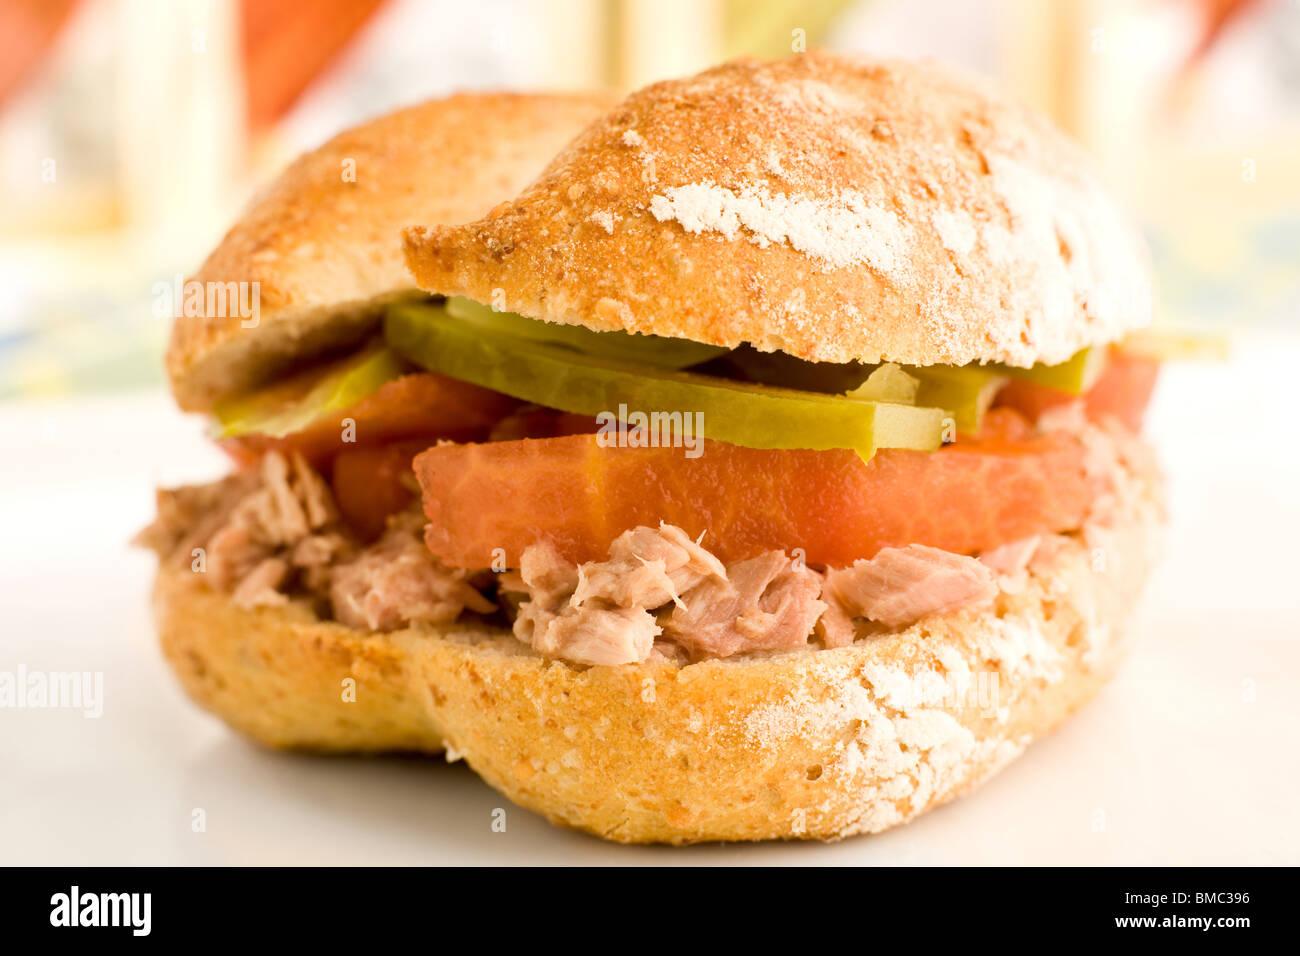 Tuna and tomato Sandwich - Stock Image